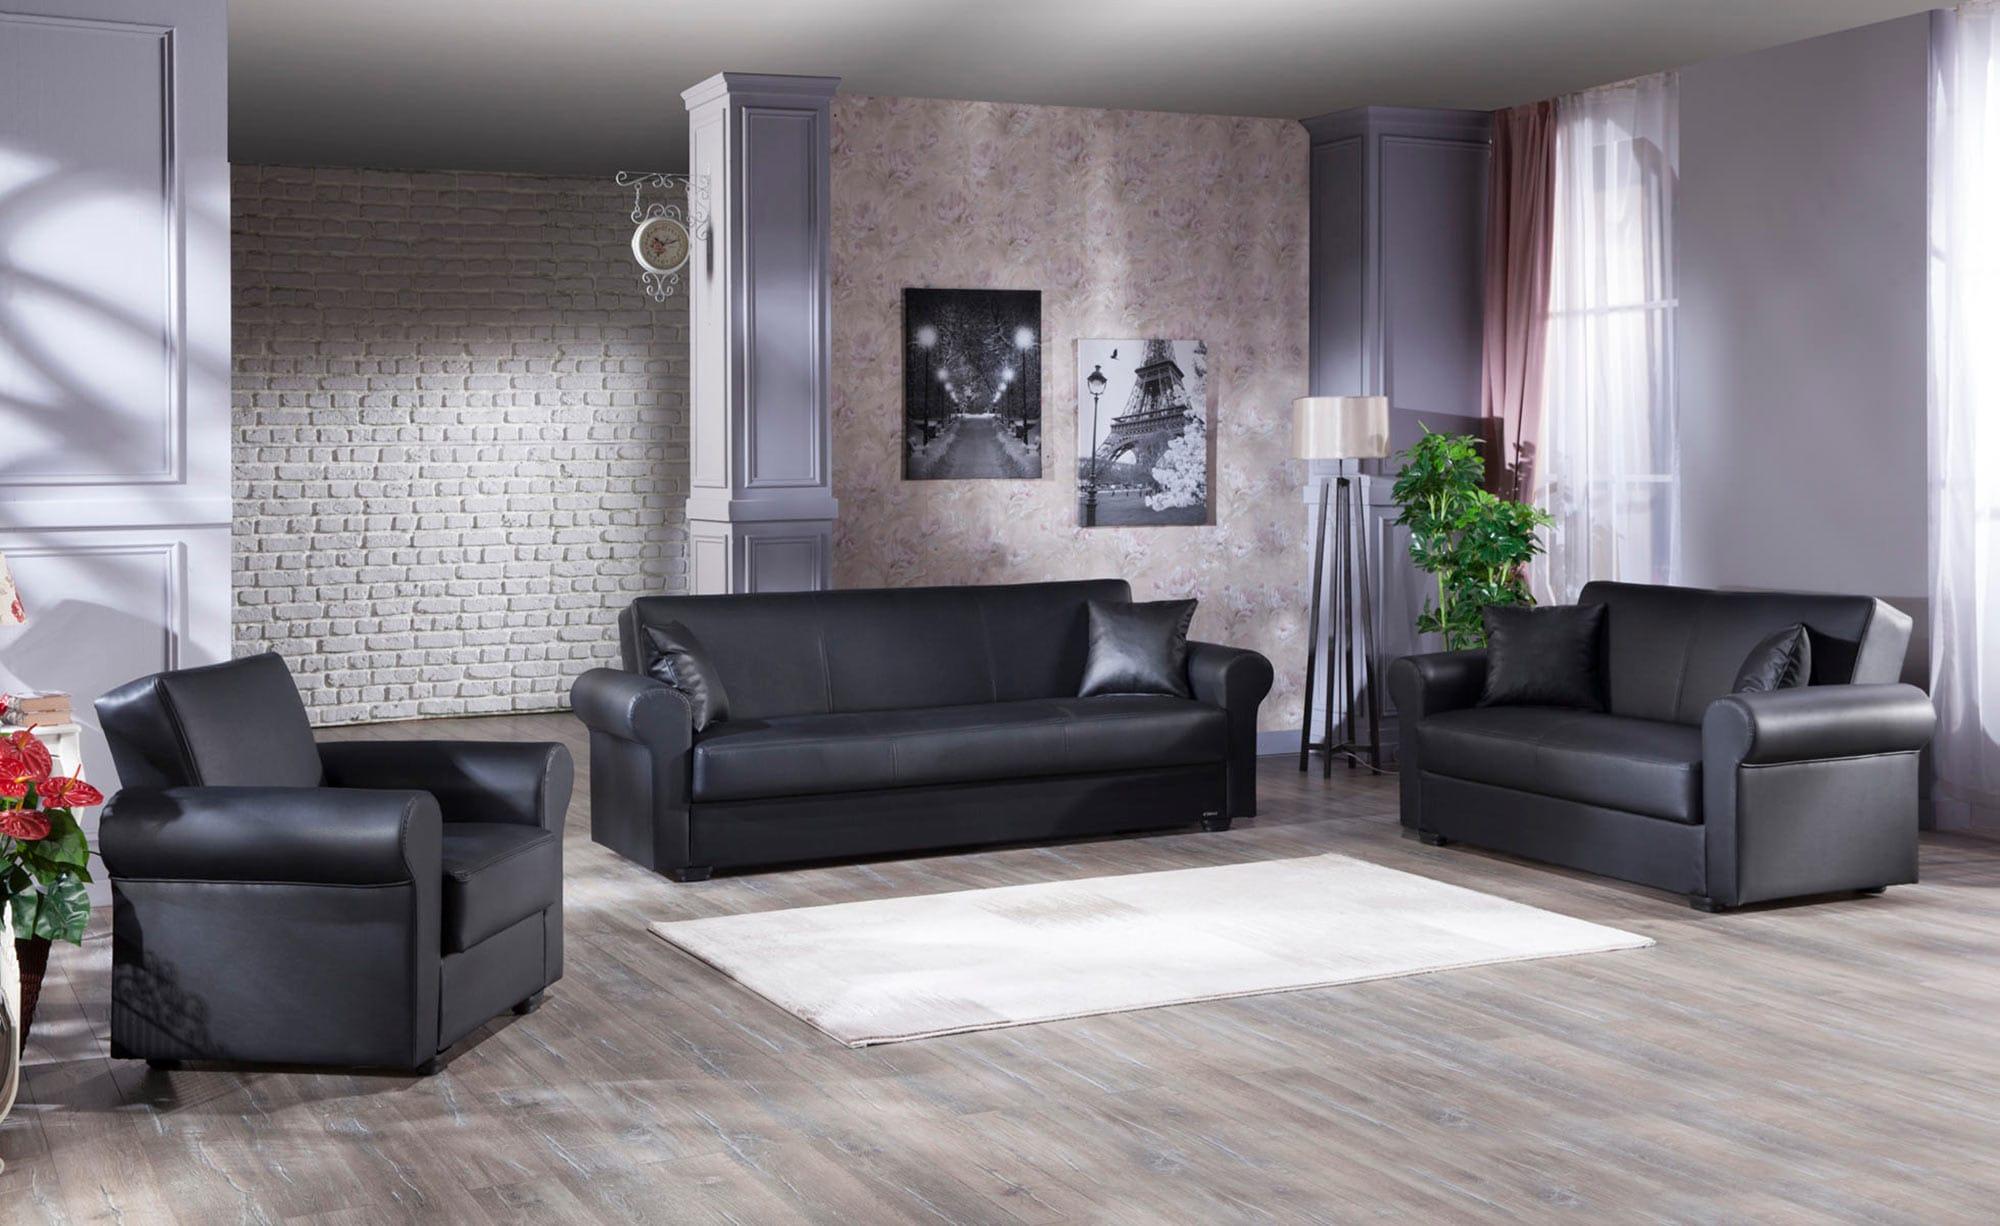 Prime Floris Santa Glory Black Sofa Love Chair Set By Istikbal Furniture Ibusinesslaw Wood Chair Design Ideas Ibusinesslaworg